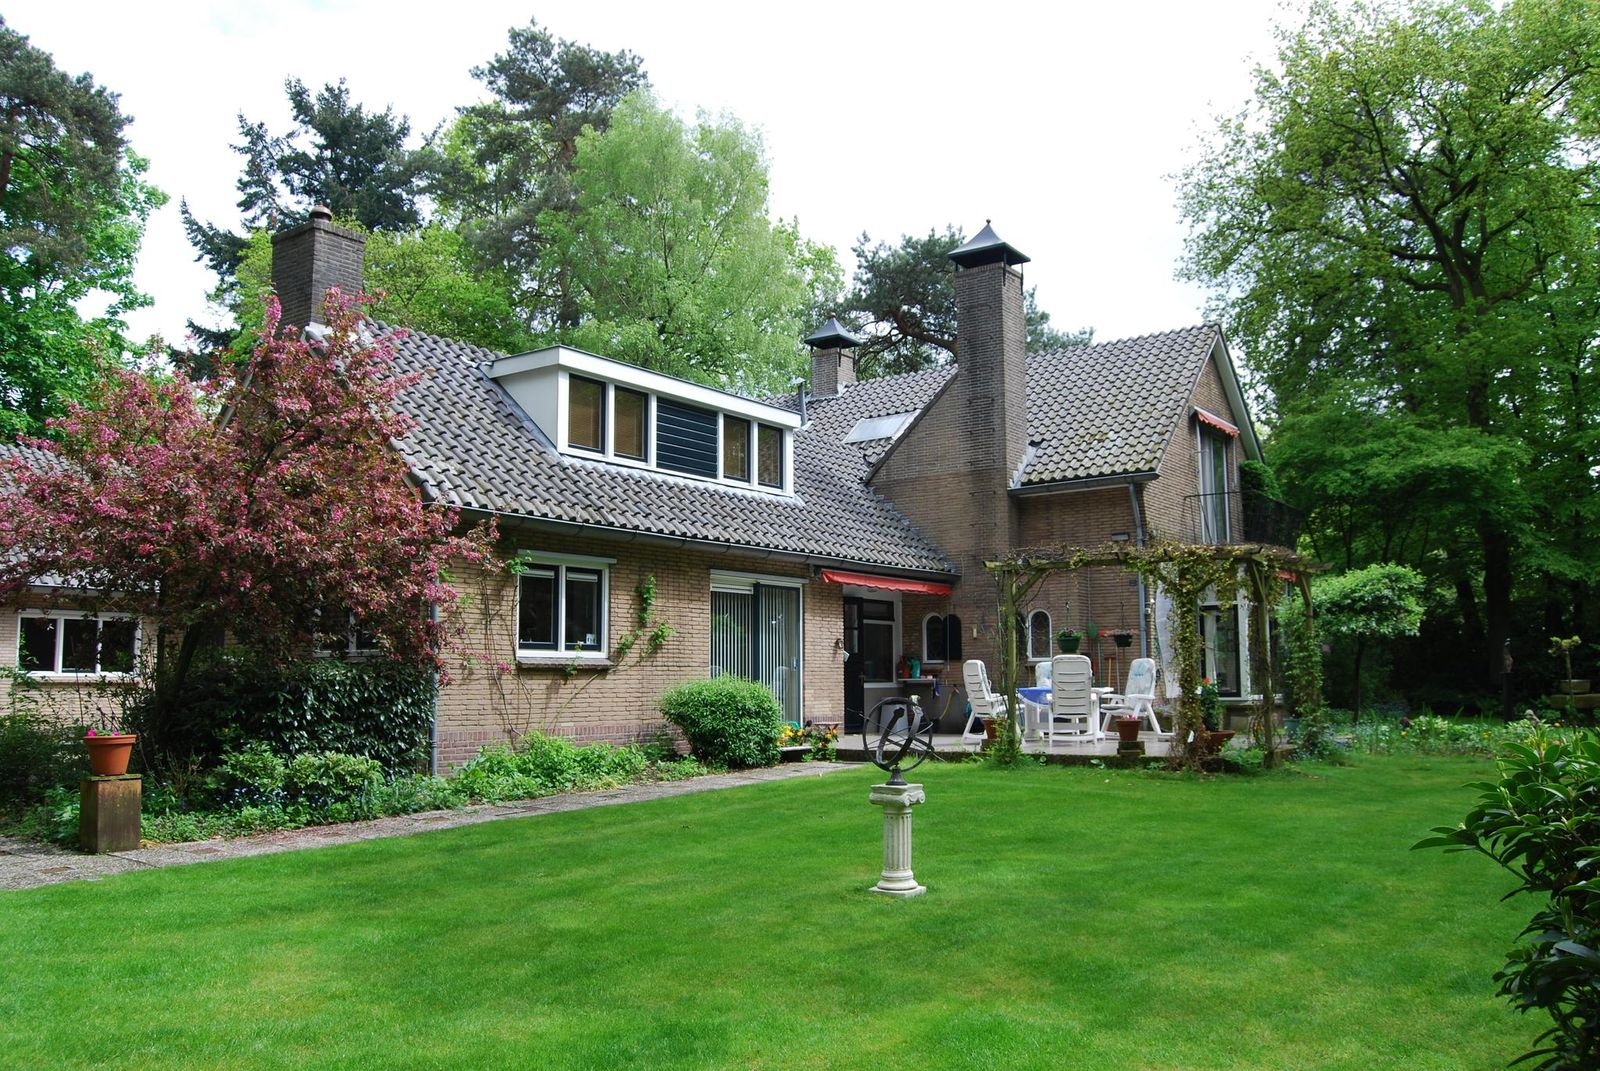 Utrechtseweg 441, Doorwerth